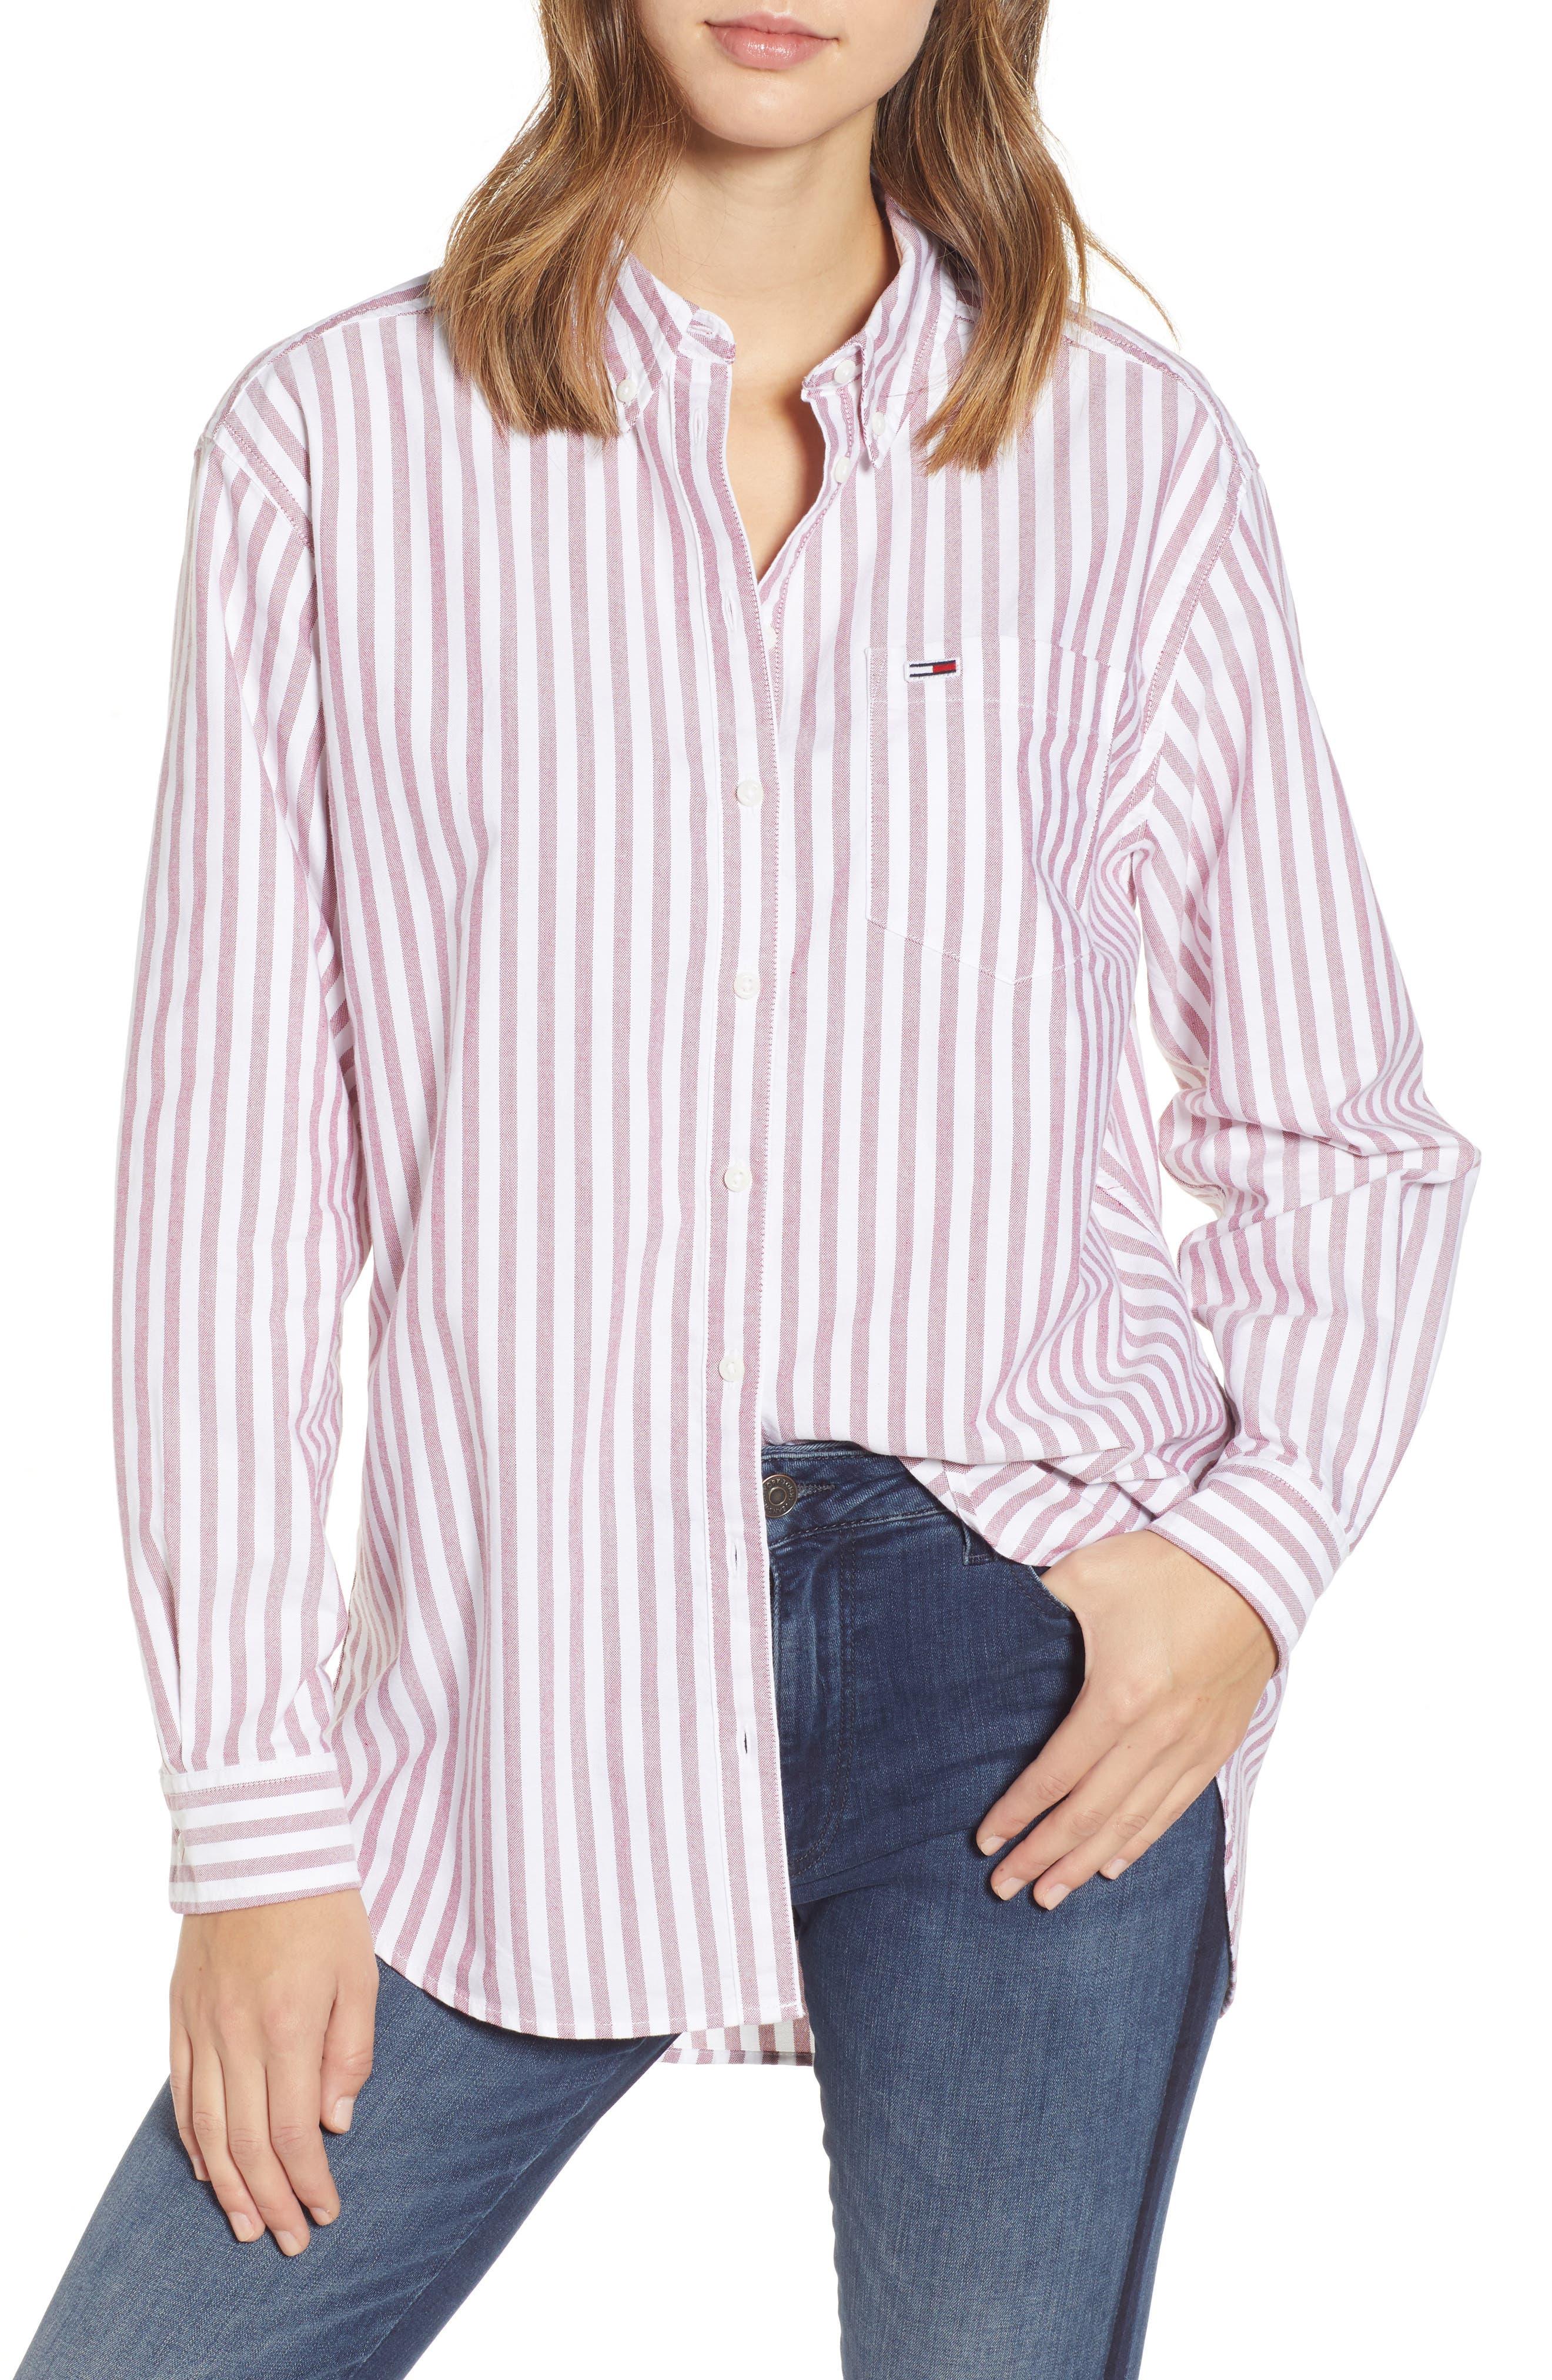 TJW Classics Stripe Shirt,                         Main,                         color, RUMBA RED / BRIGHT WHITE